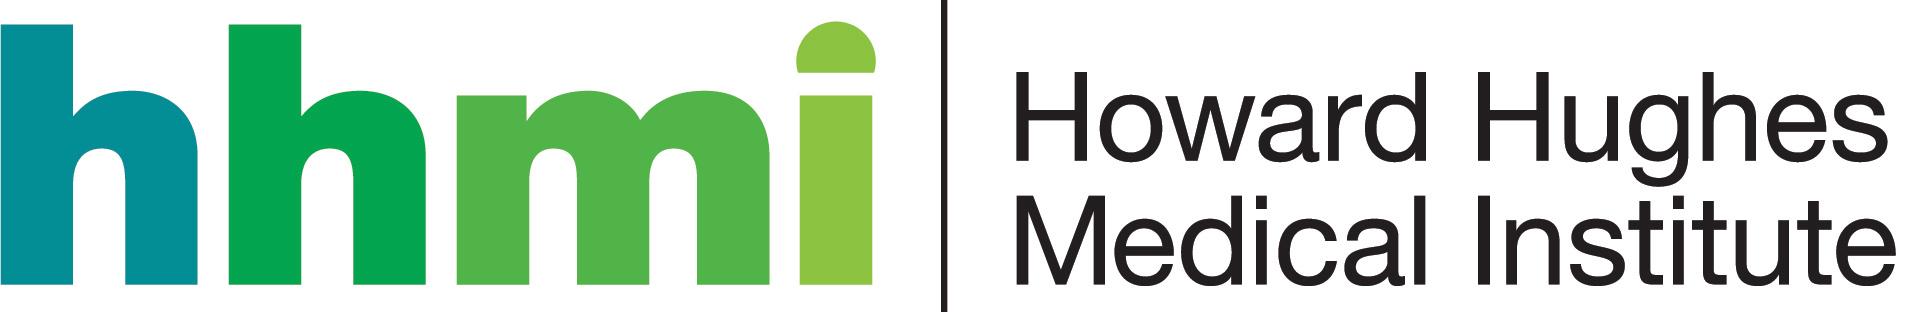 HHMI-logo.jpg